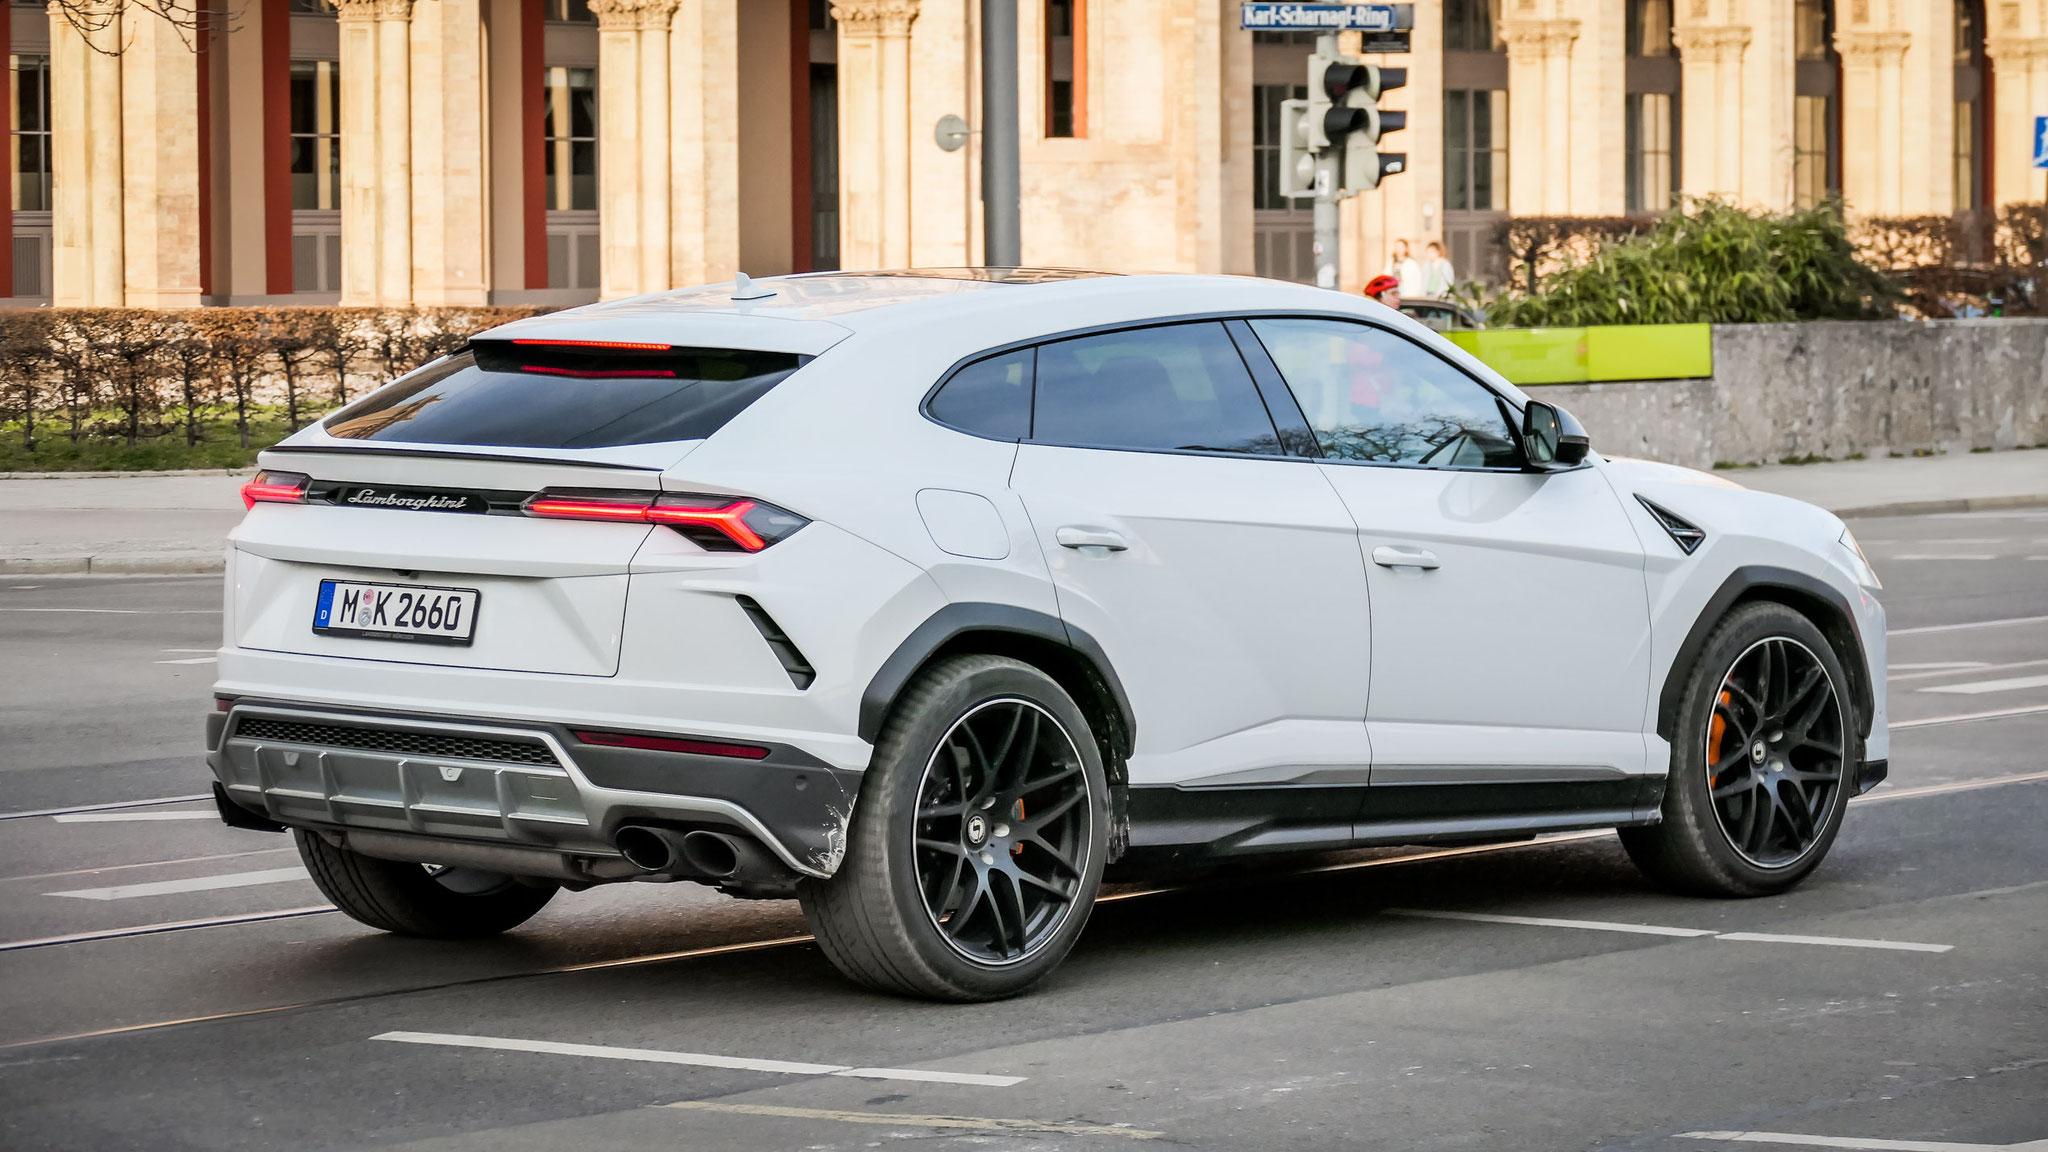 Lamborghini Urus - M-K-2660